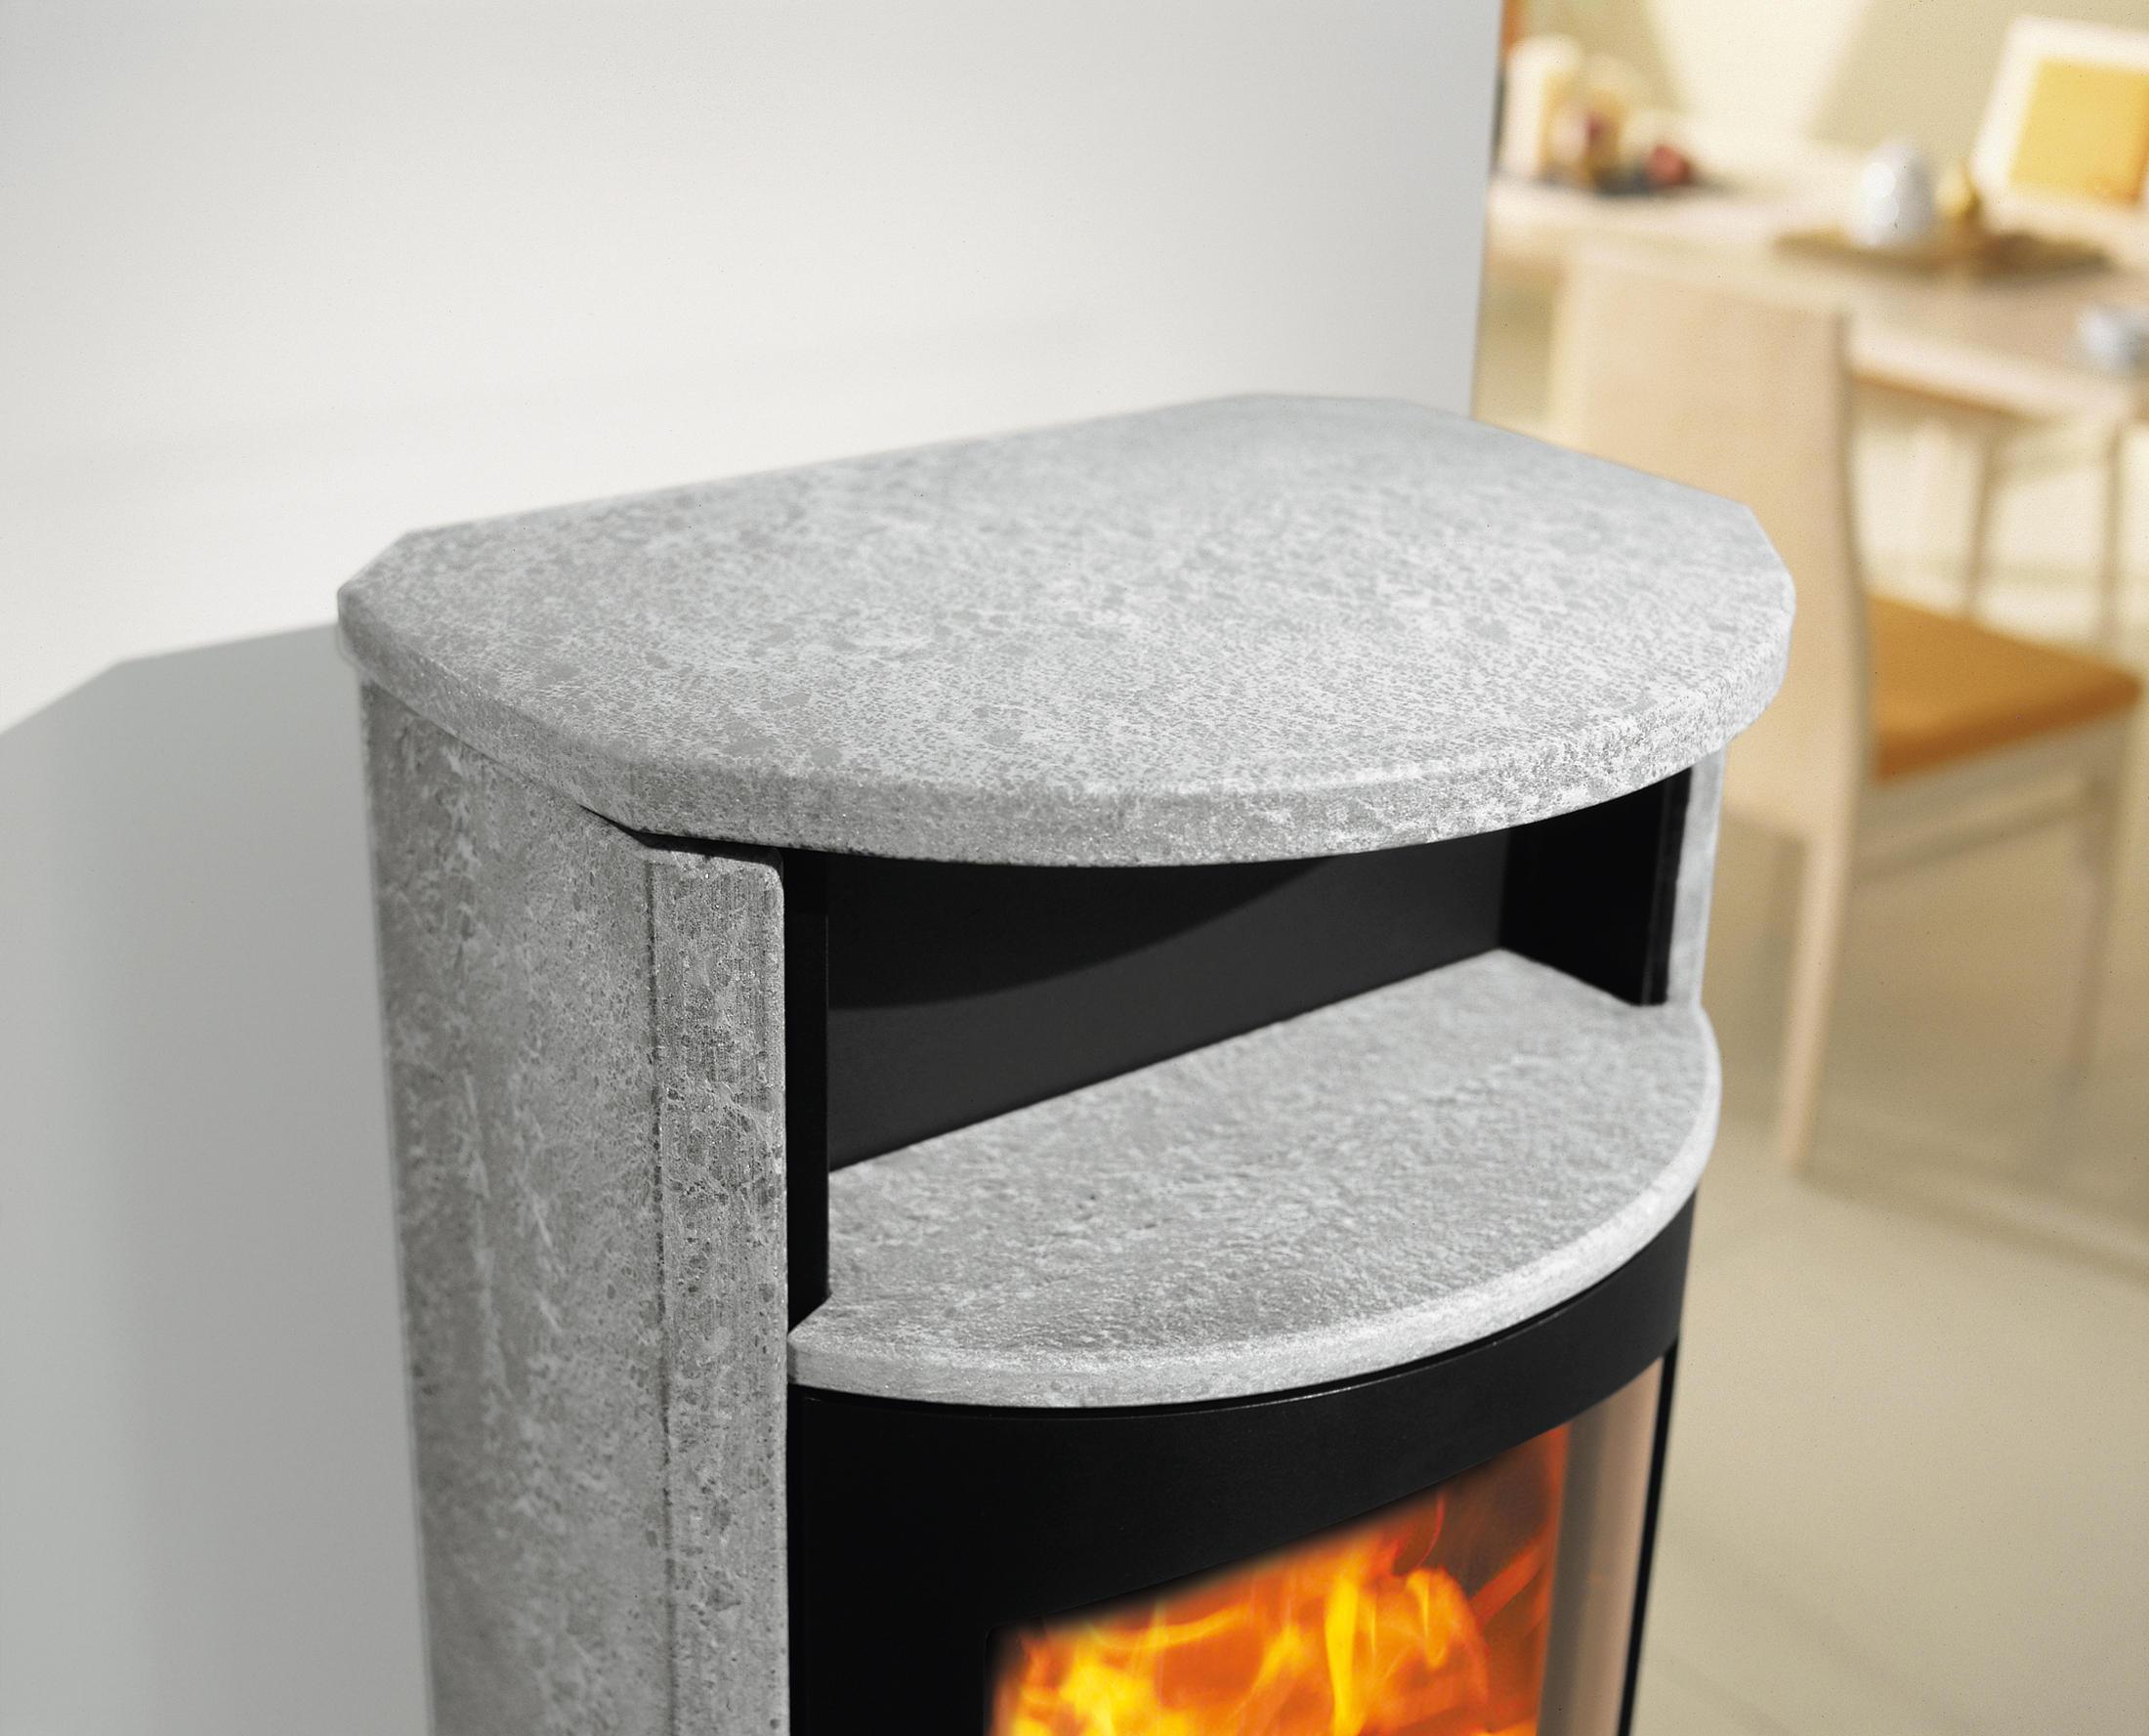 KOKO - Wood burning stoves from Austroflamm | Architonic